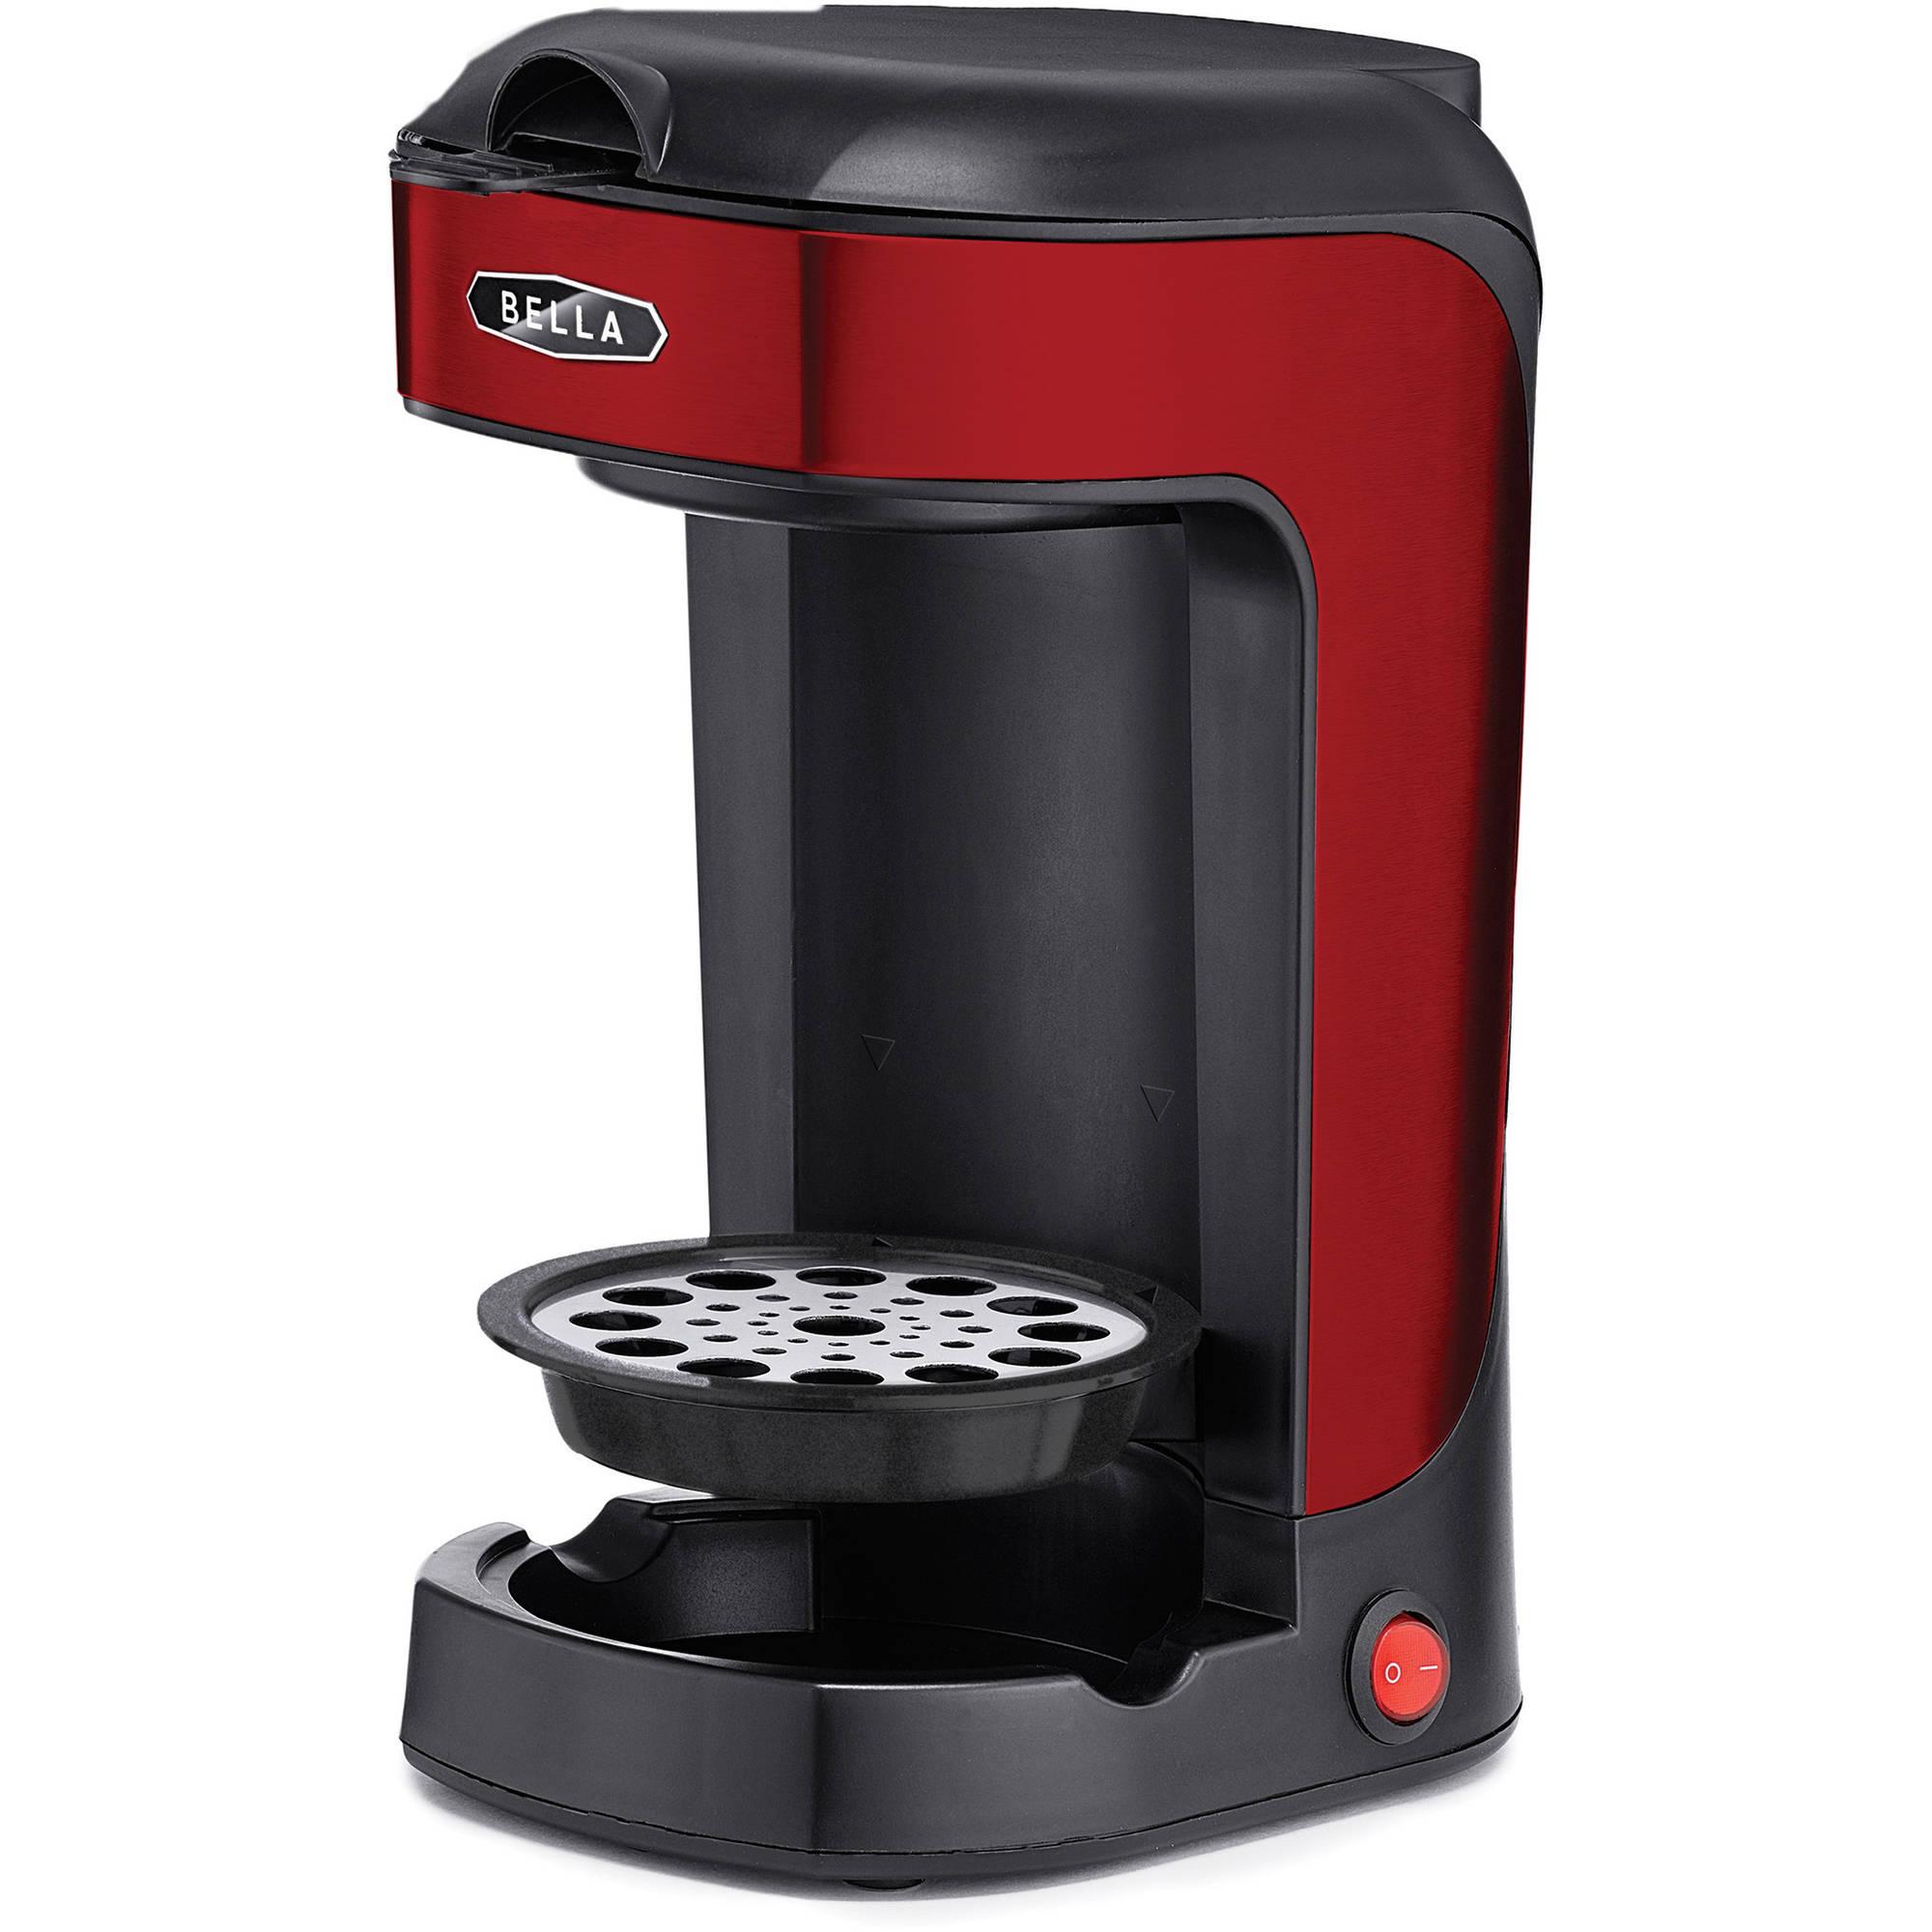 BELLA Single Scoop Coffee Maker, Red